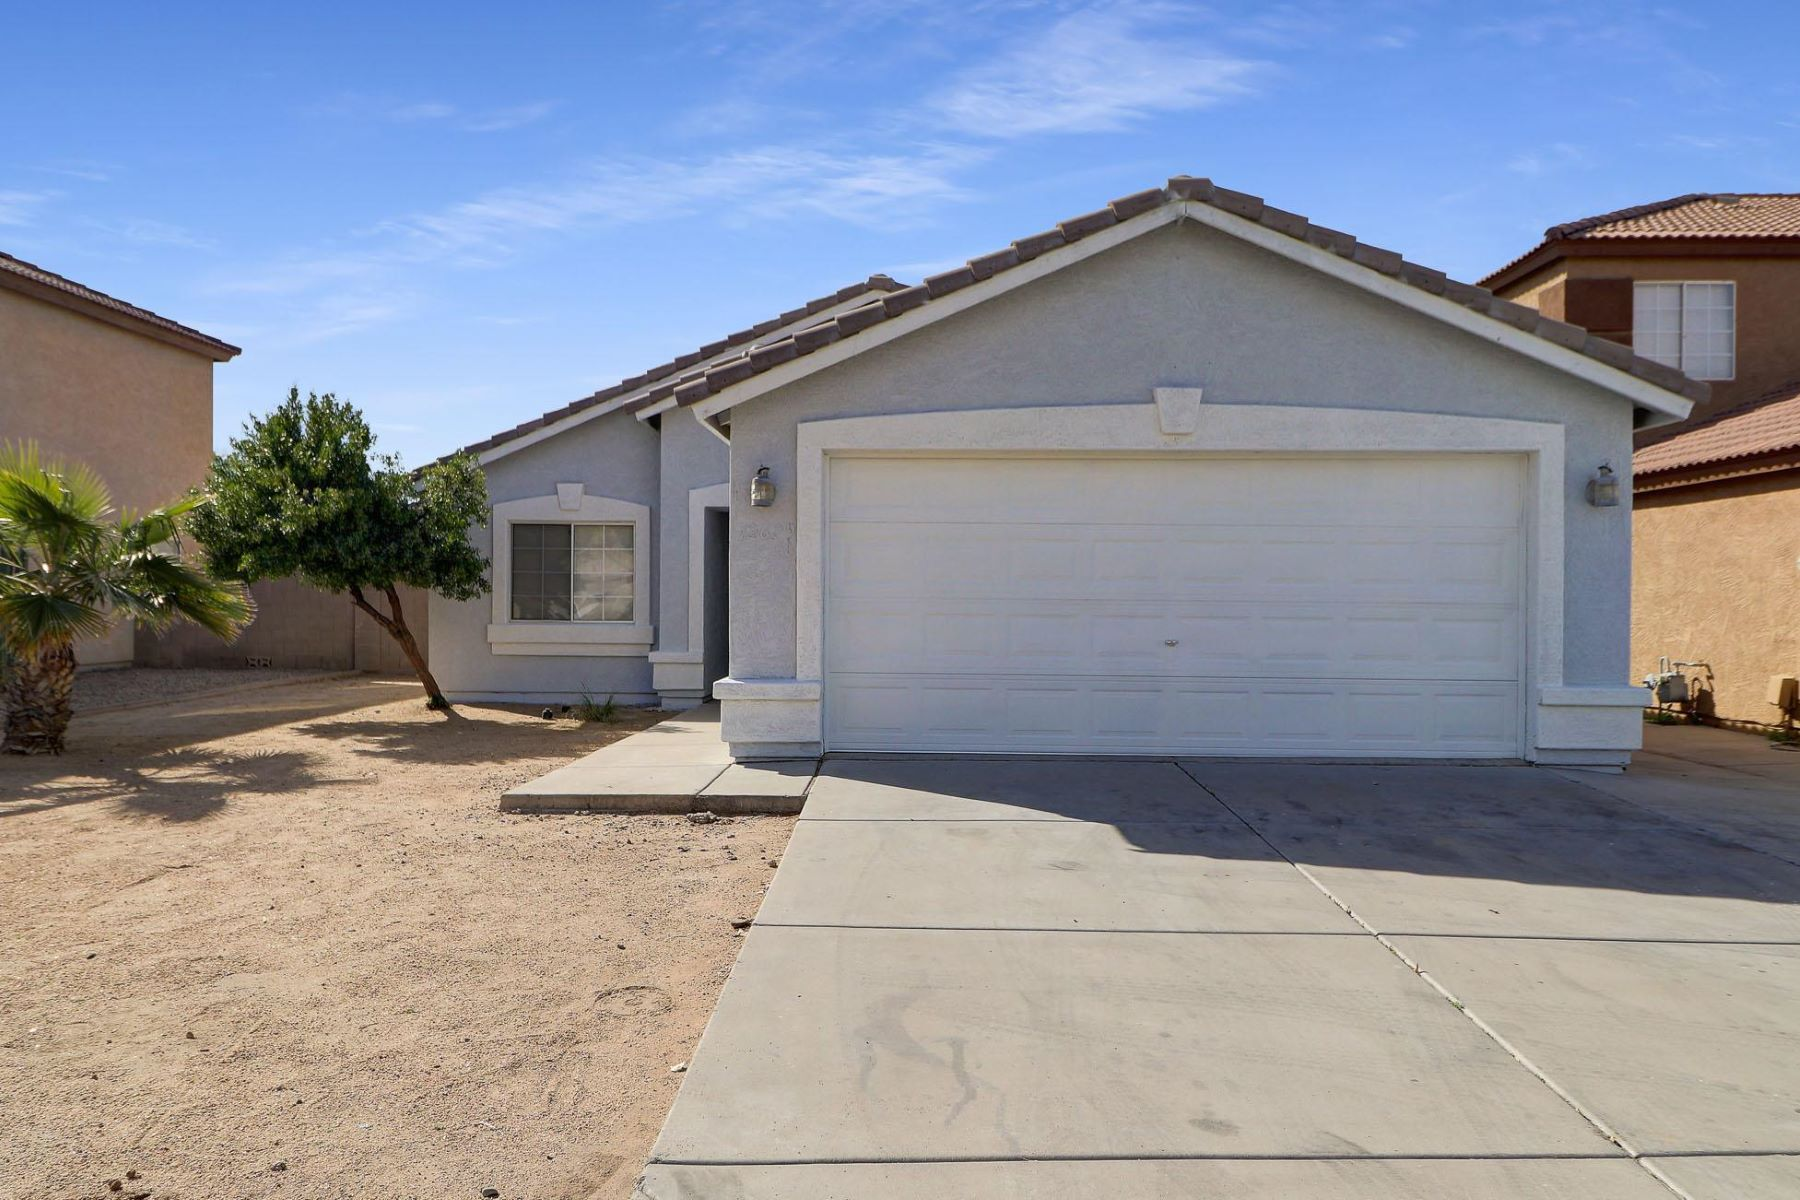 Single Family Homes για την Πώληση στο Parque Verde 12629 W ASTER DR, El Mirage, Αριζονα 85335 Ηνωμένες Πολιτείες